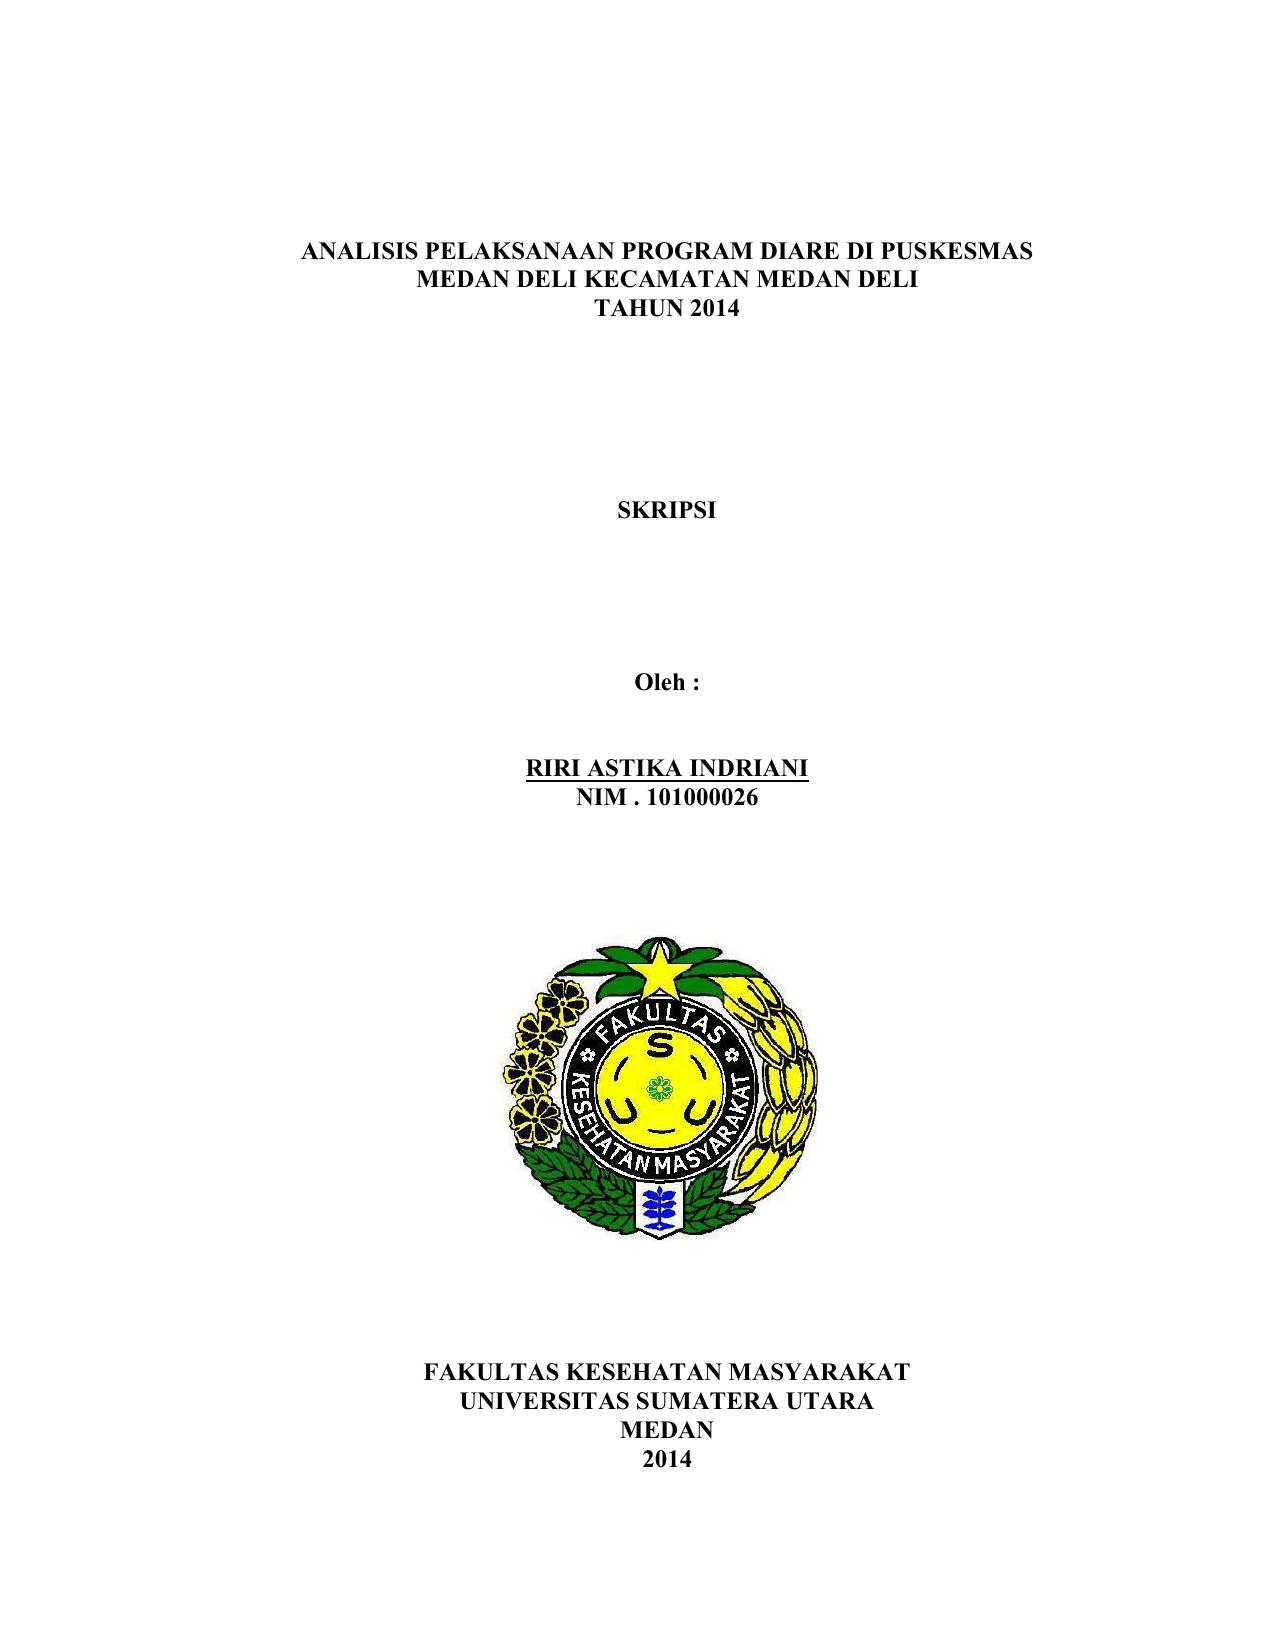 Analisis Pelaksanaan Program Diare Di Puskesmas Oralit 200 Ml Biji